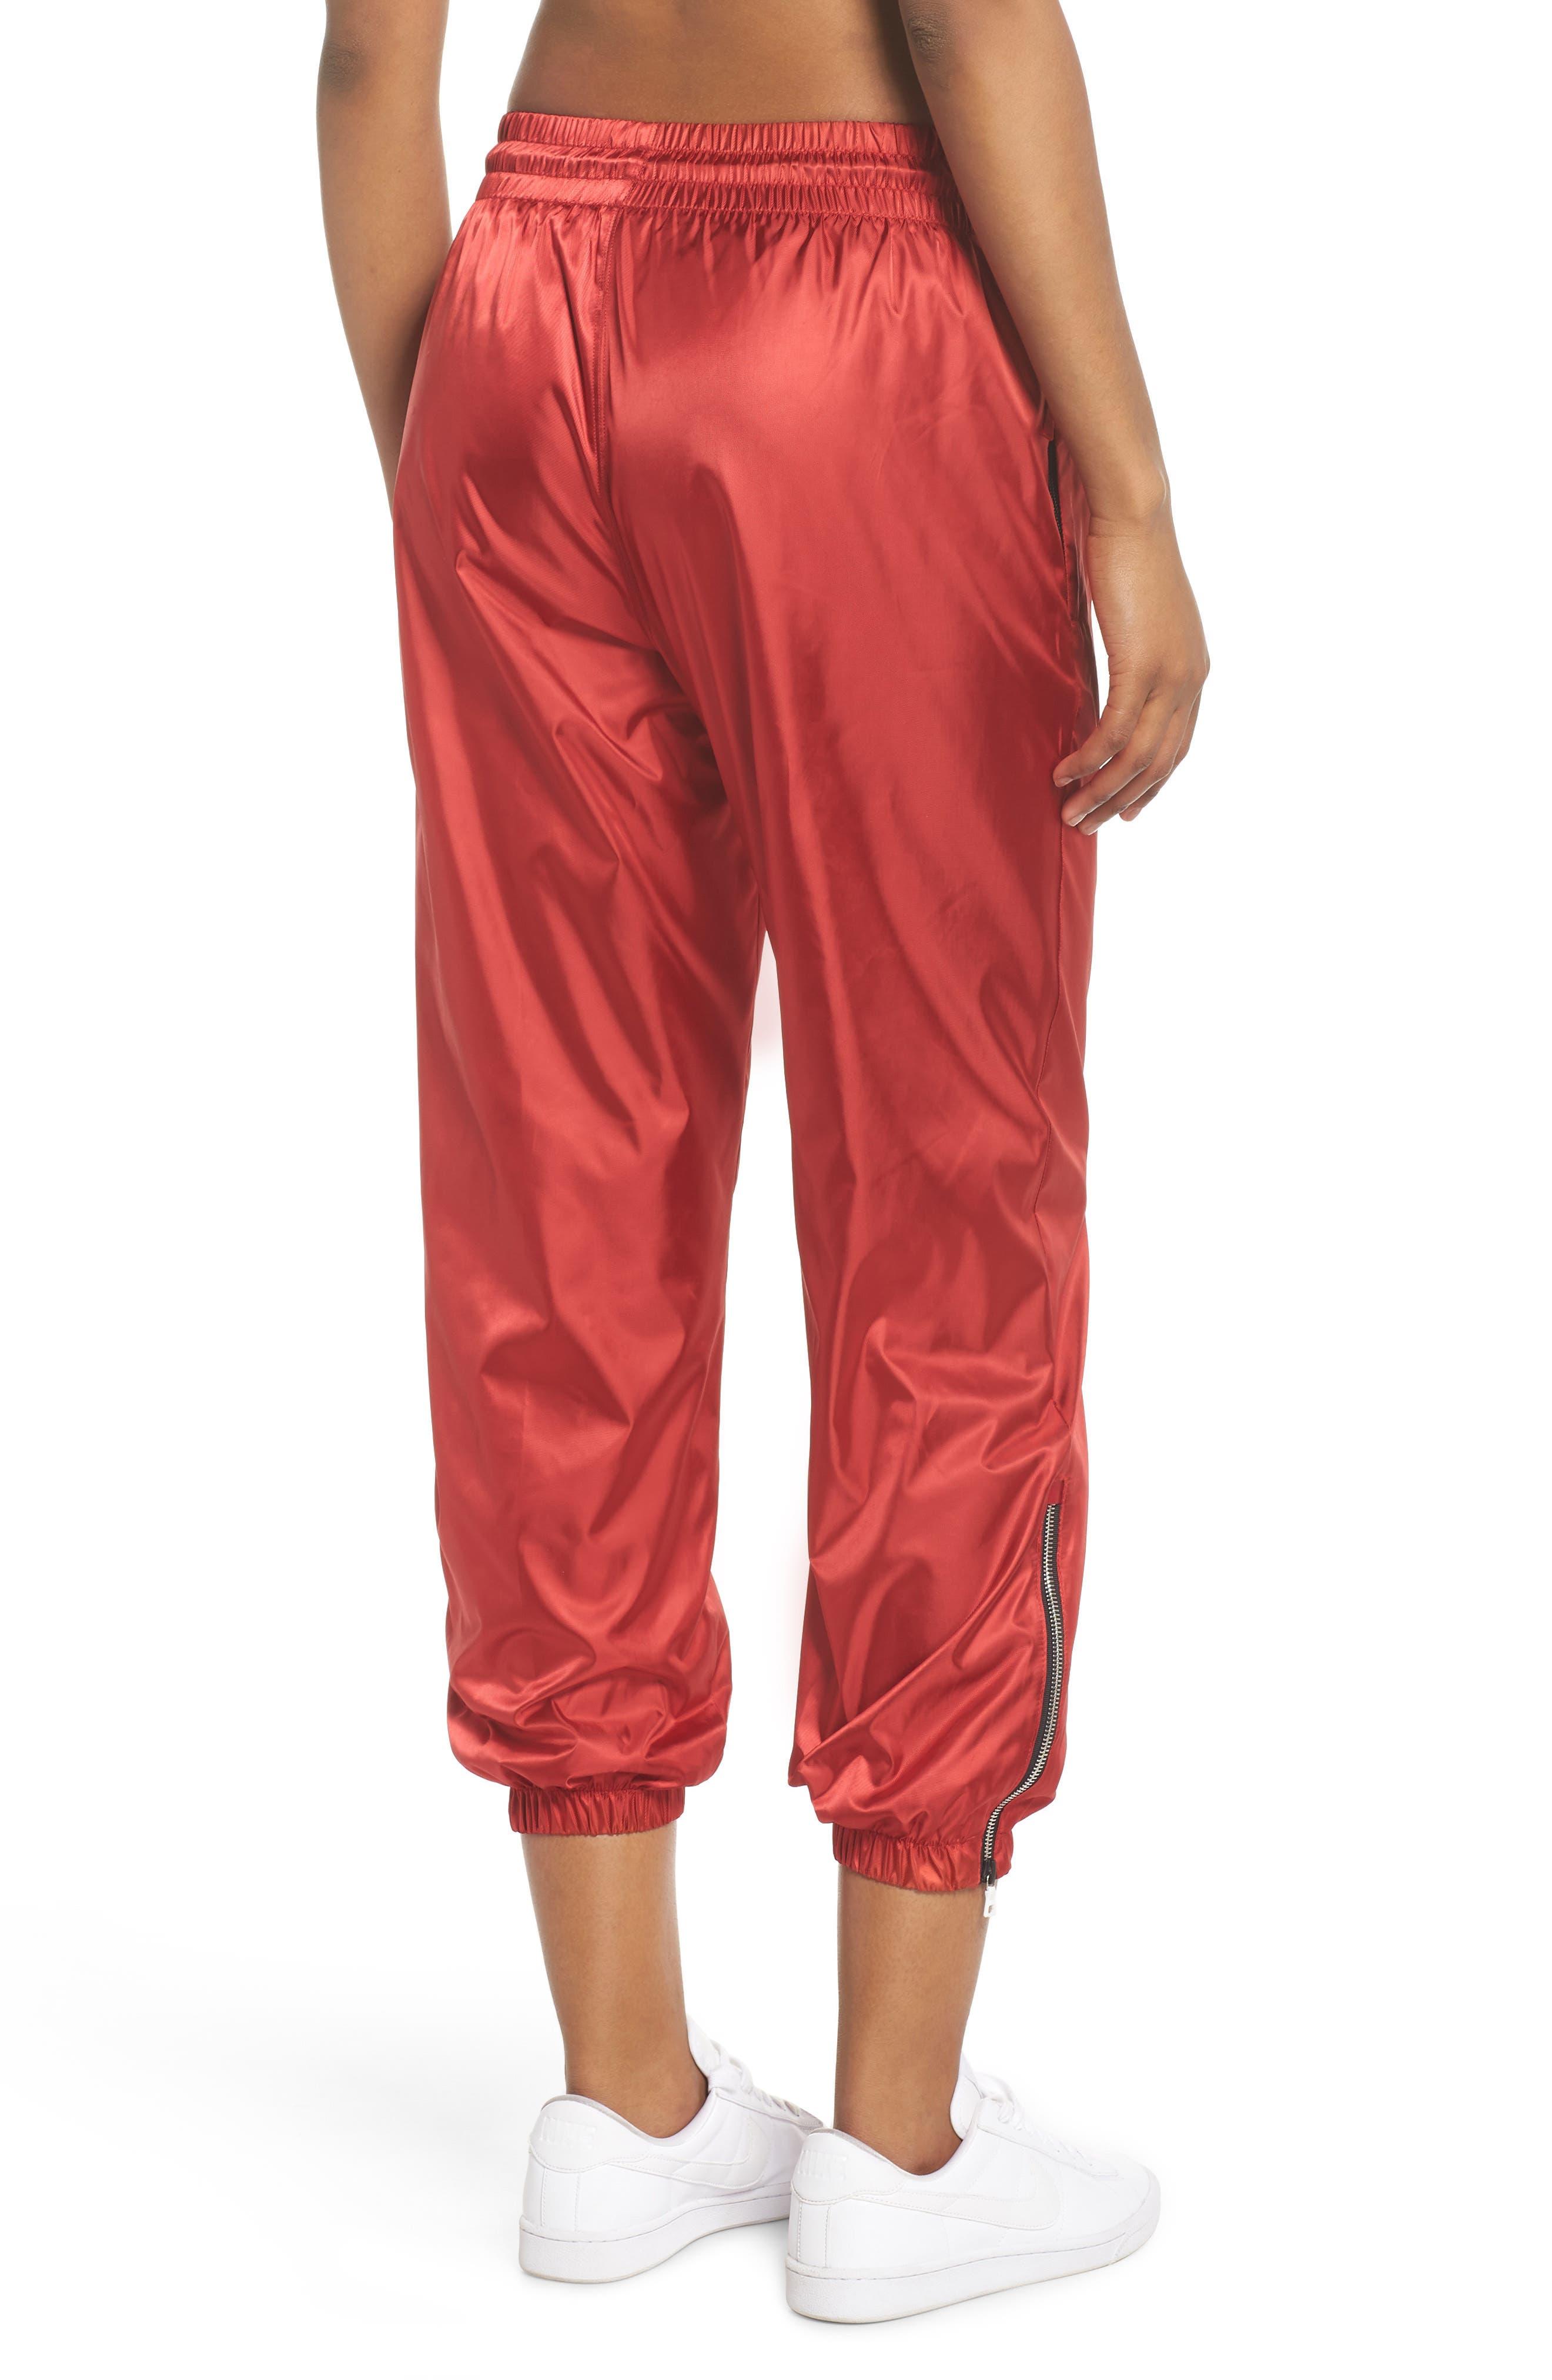 NikeLab Collection Women's Satin Track Pants,                             Alternate thumbnail 2, color,                             600